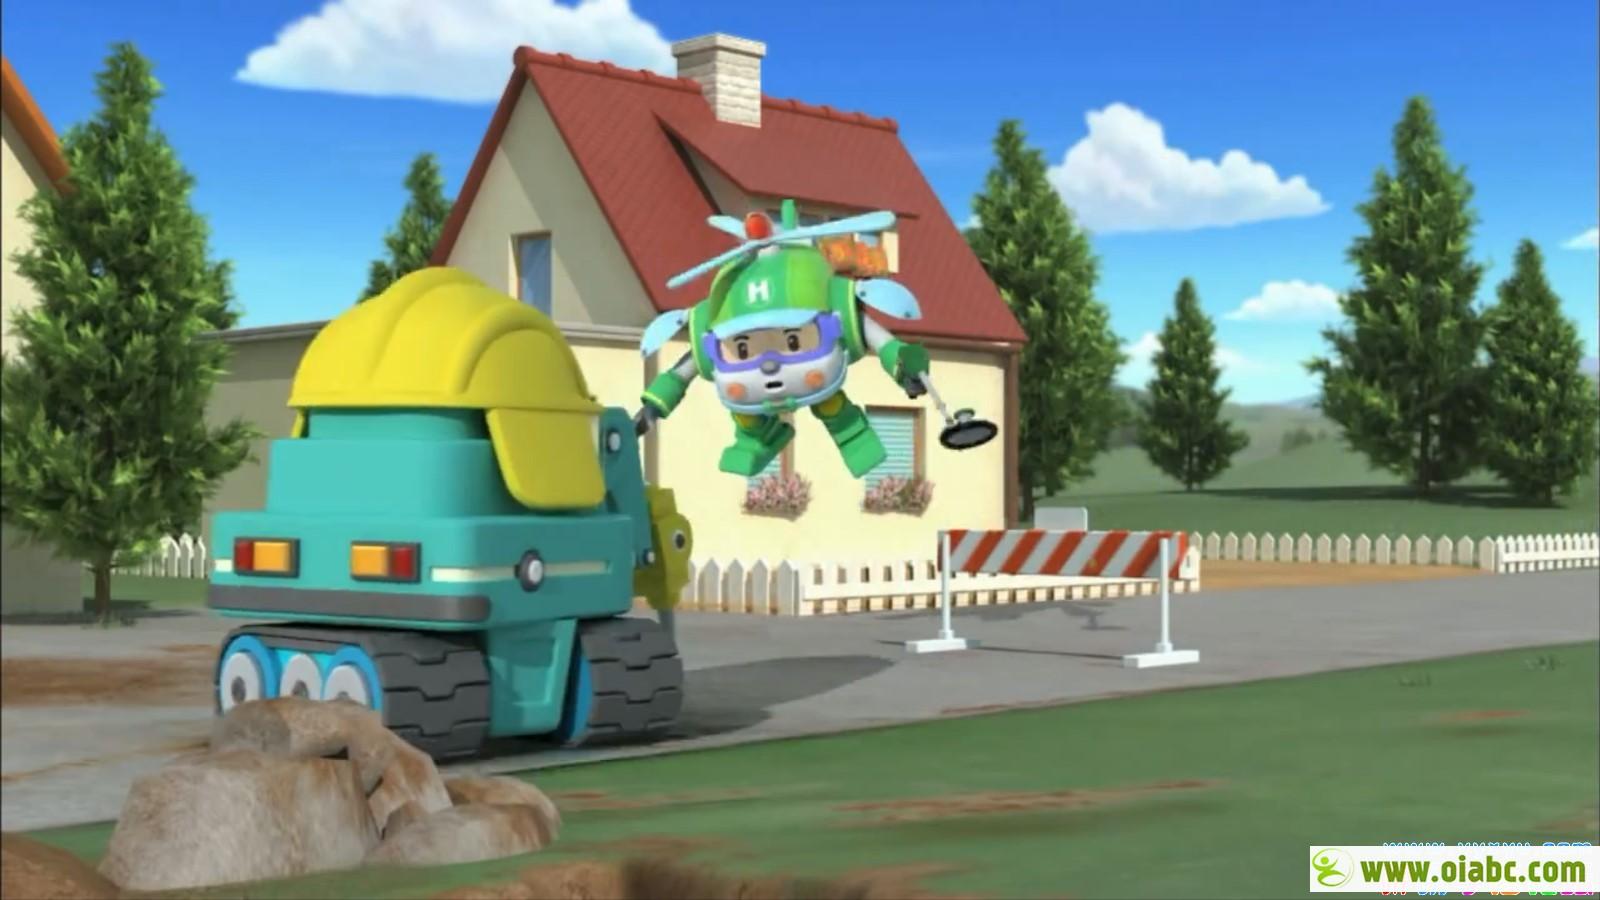 Robocar Poli 变形警车珀利英文原版动画片 第一二季全52集mp4格式720p 百度网盘下载